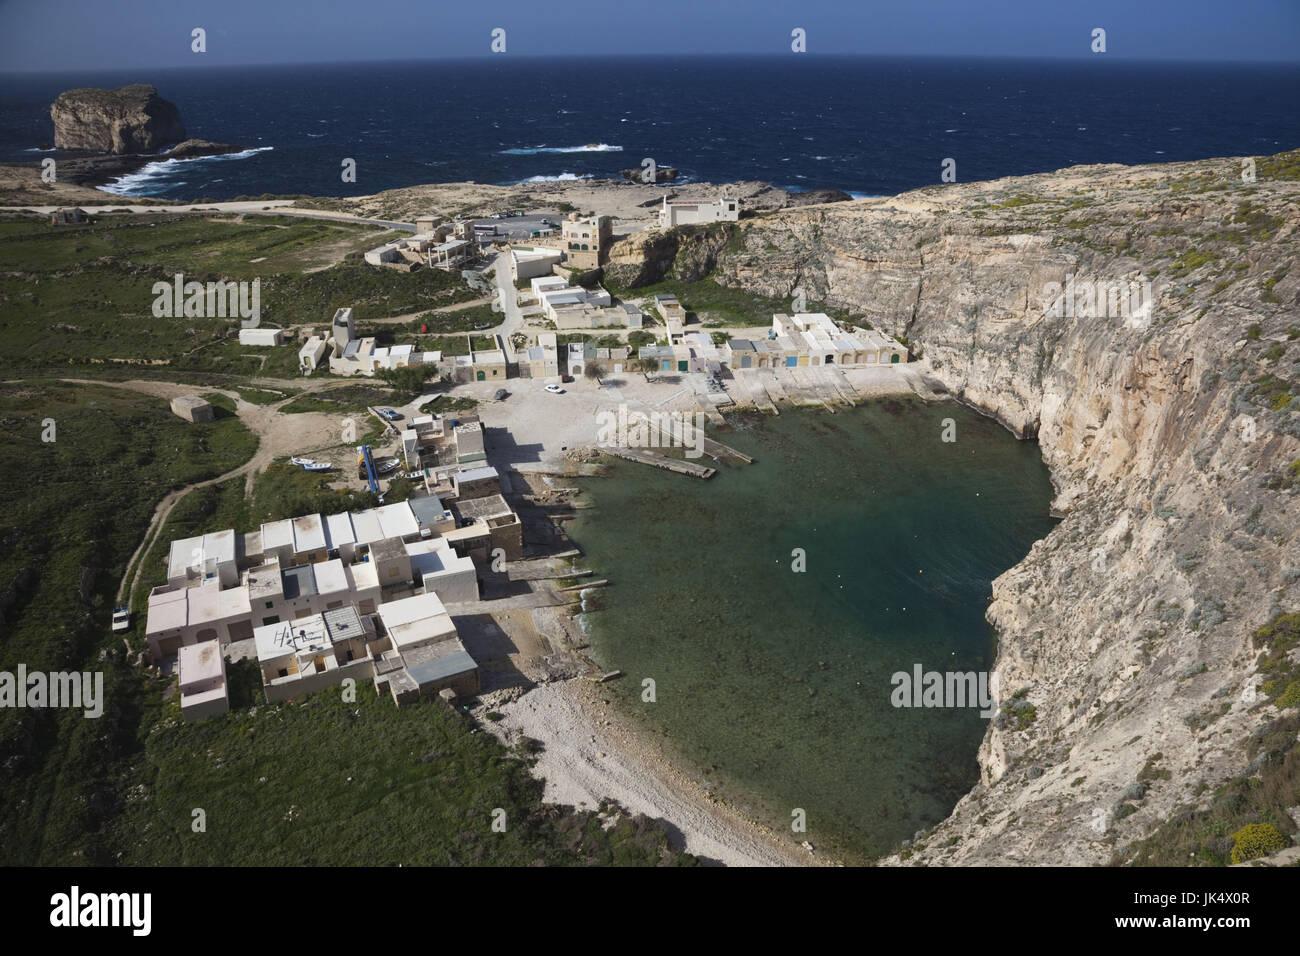 Malta, Gozo Island, Dwejra, elevated view of the Inland Sea - Stock Image